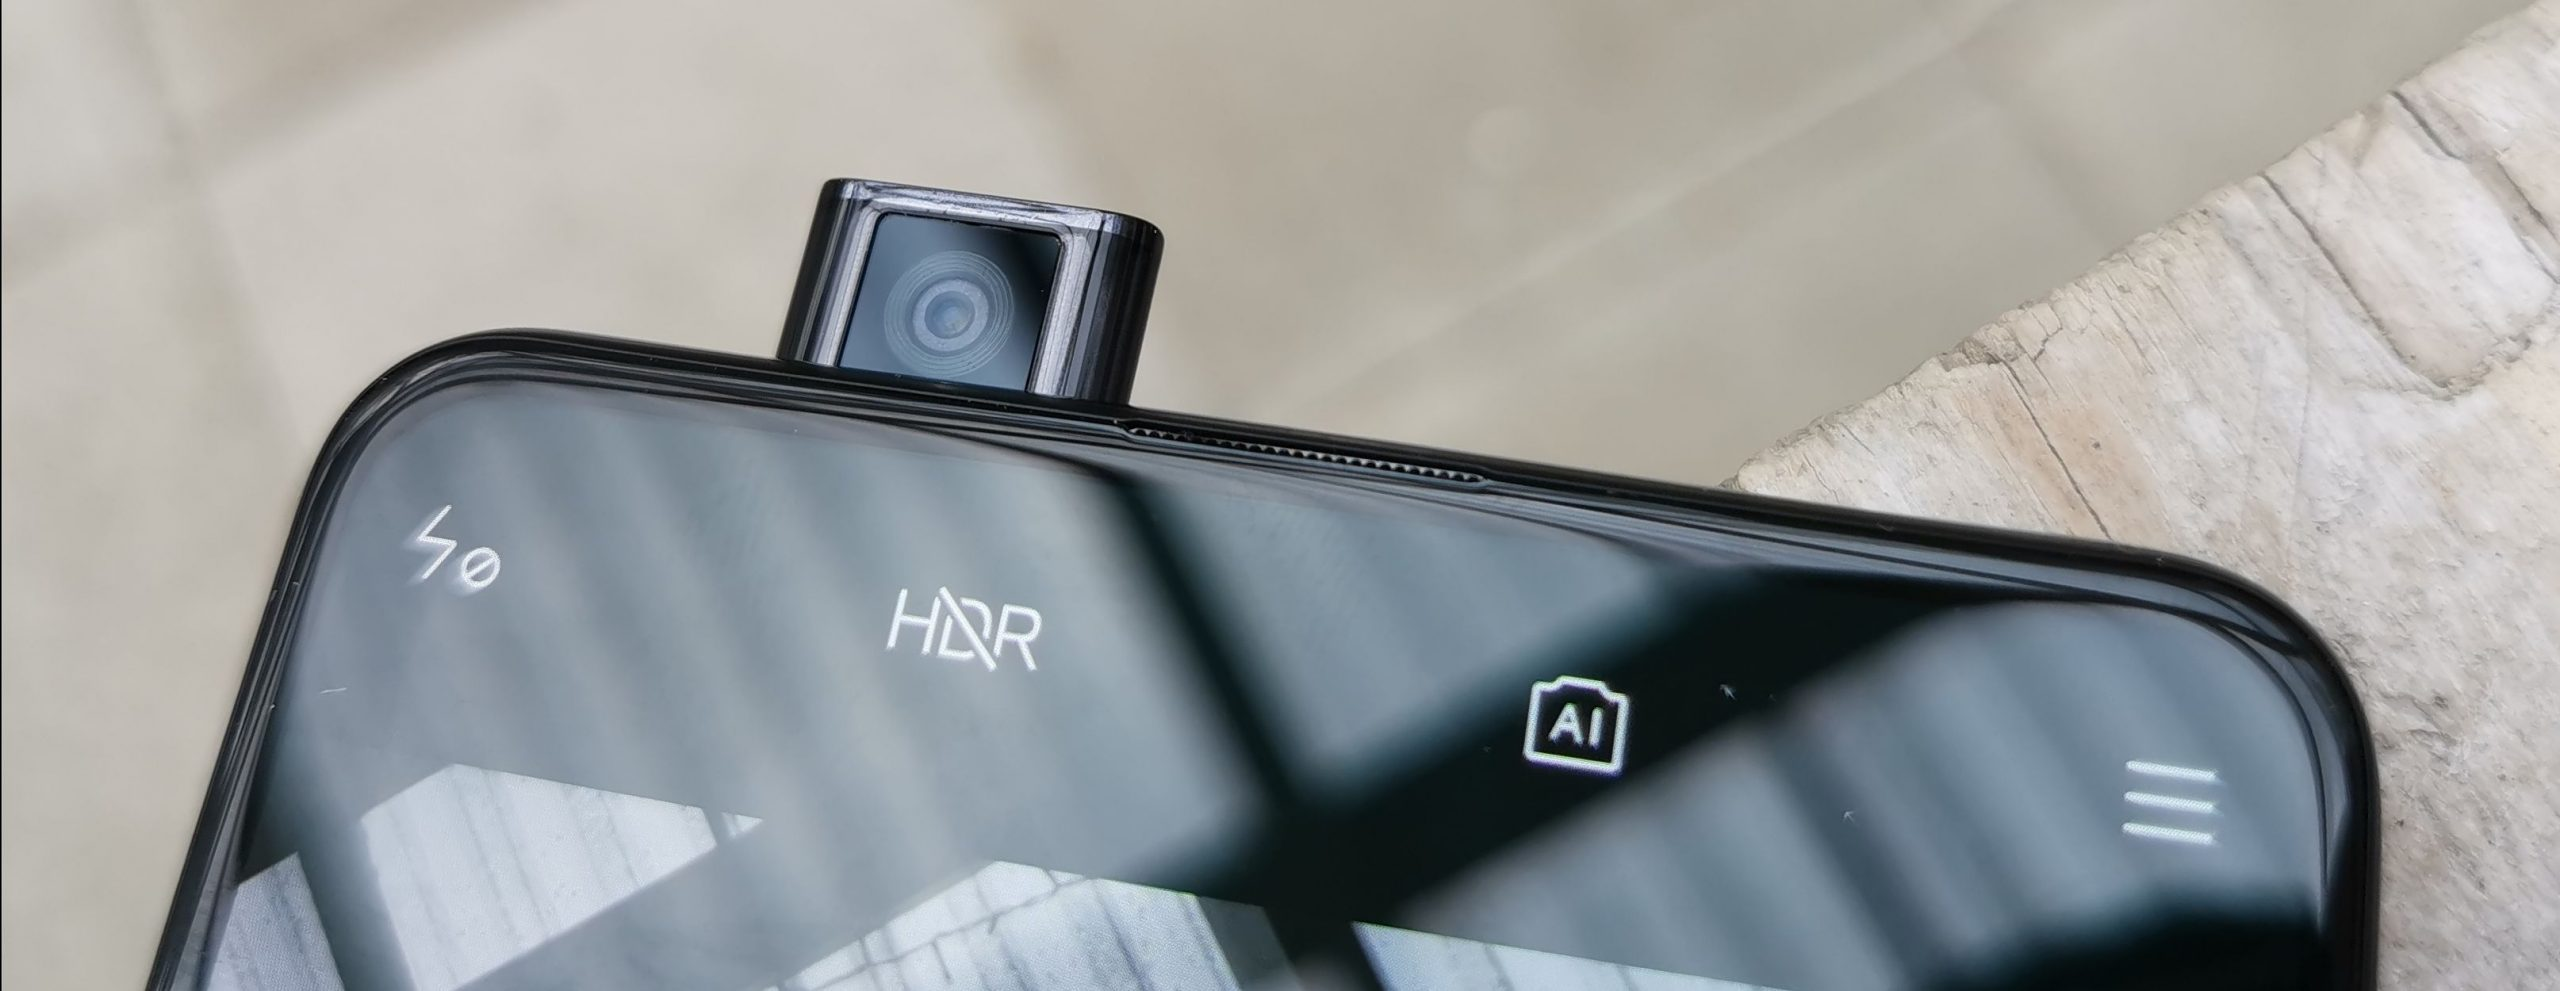 Xiaomi Mi 9T:n erikoisuus on esiin nouseva etukamera.